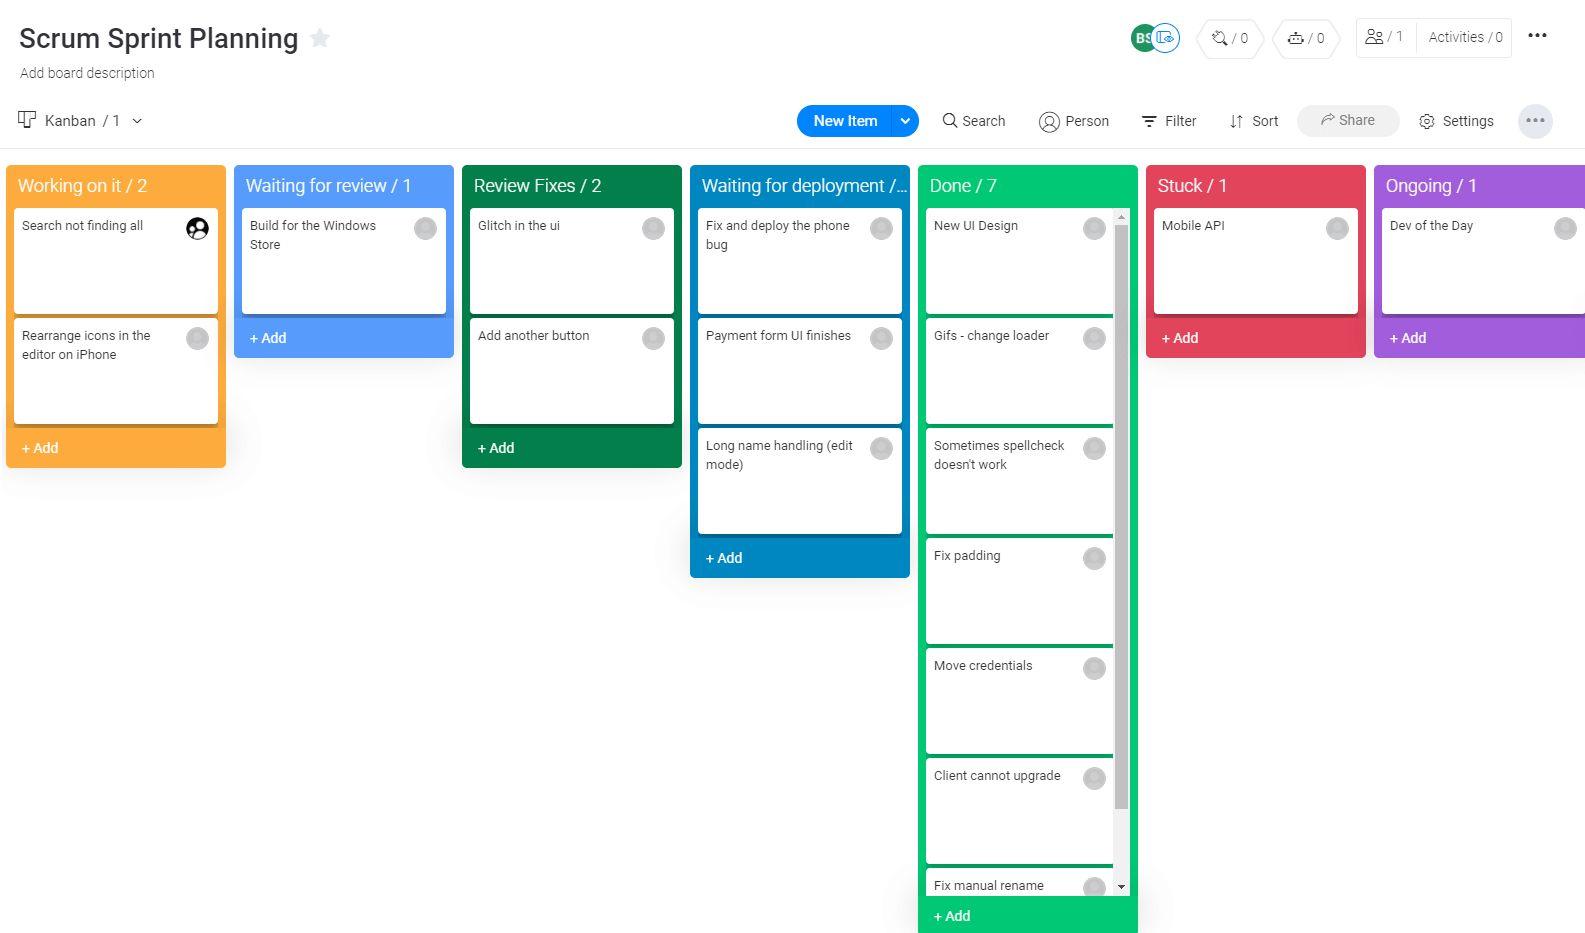 A screenshot showing a kanban view of a scrum board